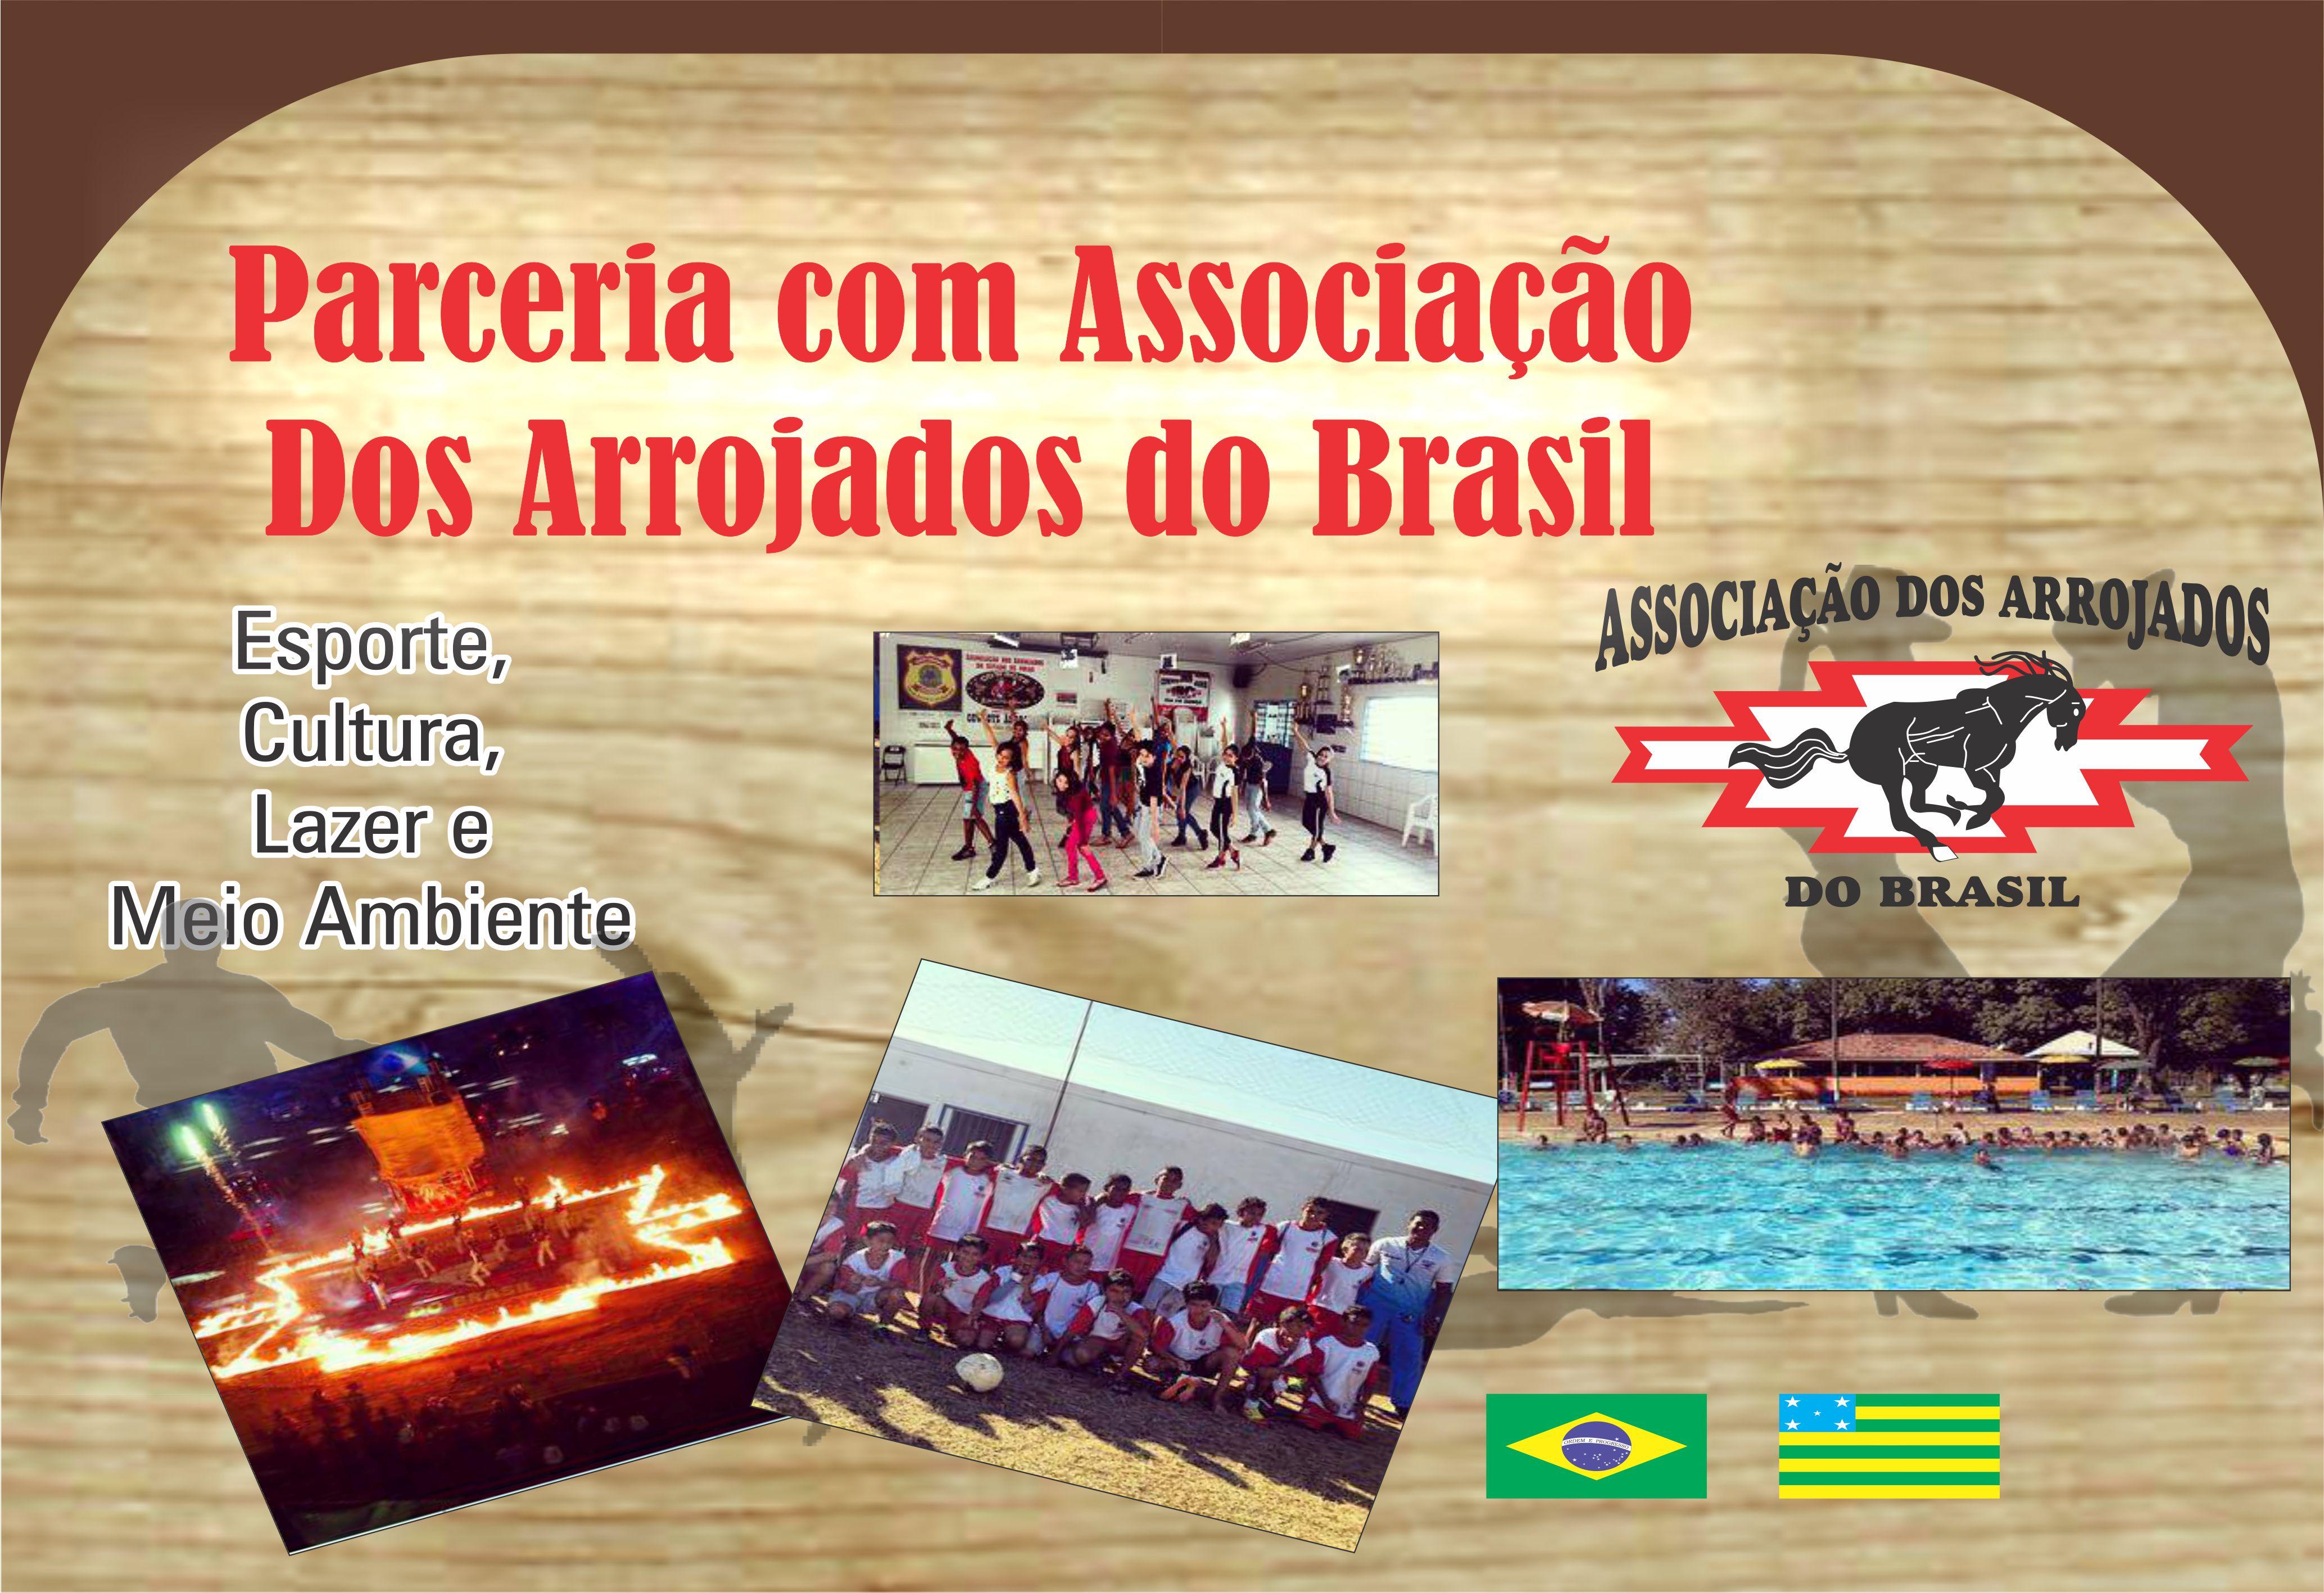 Arrojados do Brasil